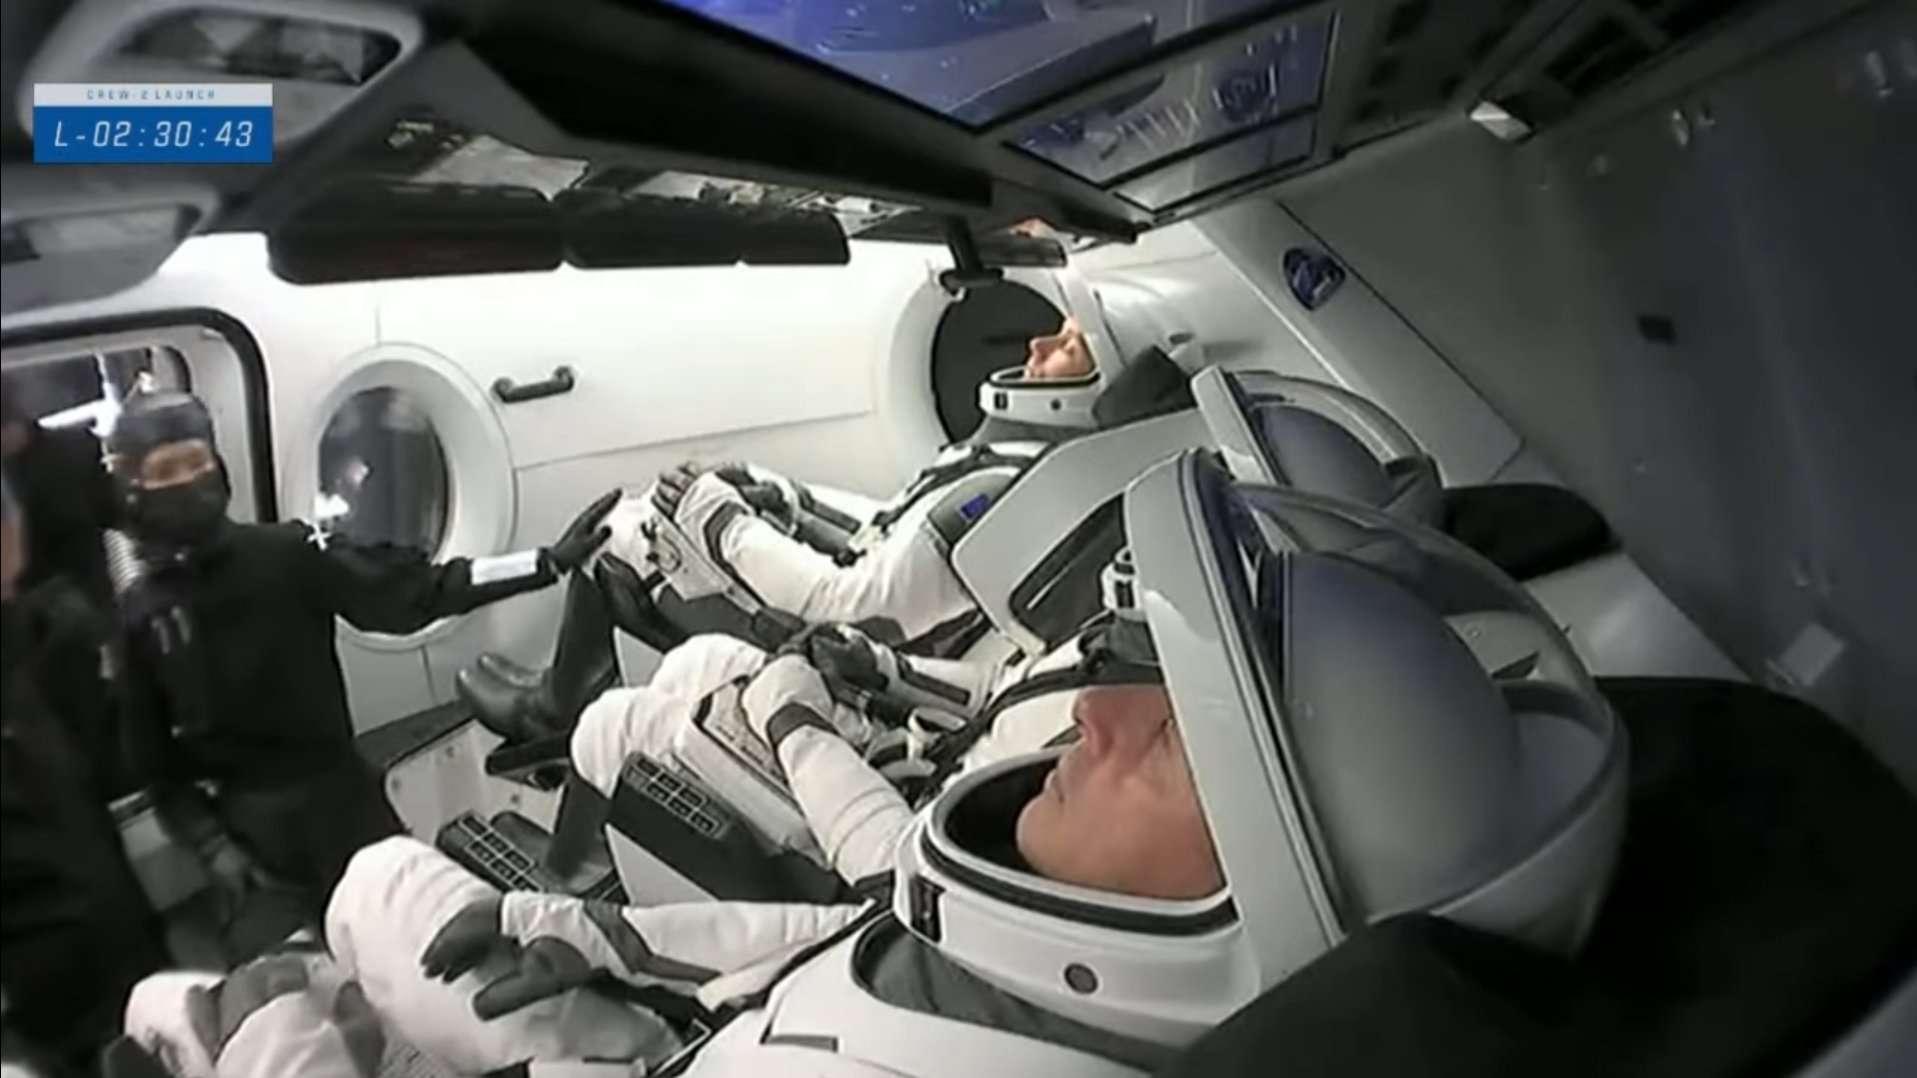 Thomas Pesquet, Megan McArthur, Shane Kimbrough et Akihiko Hoshide à bord de Crew Dragon. © Nasa, SpaceX